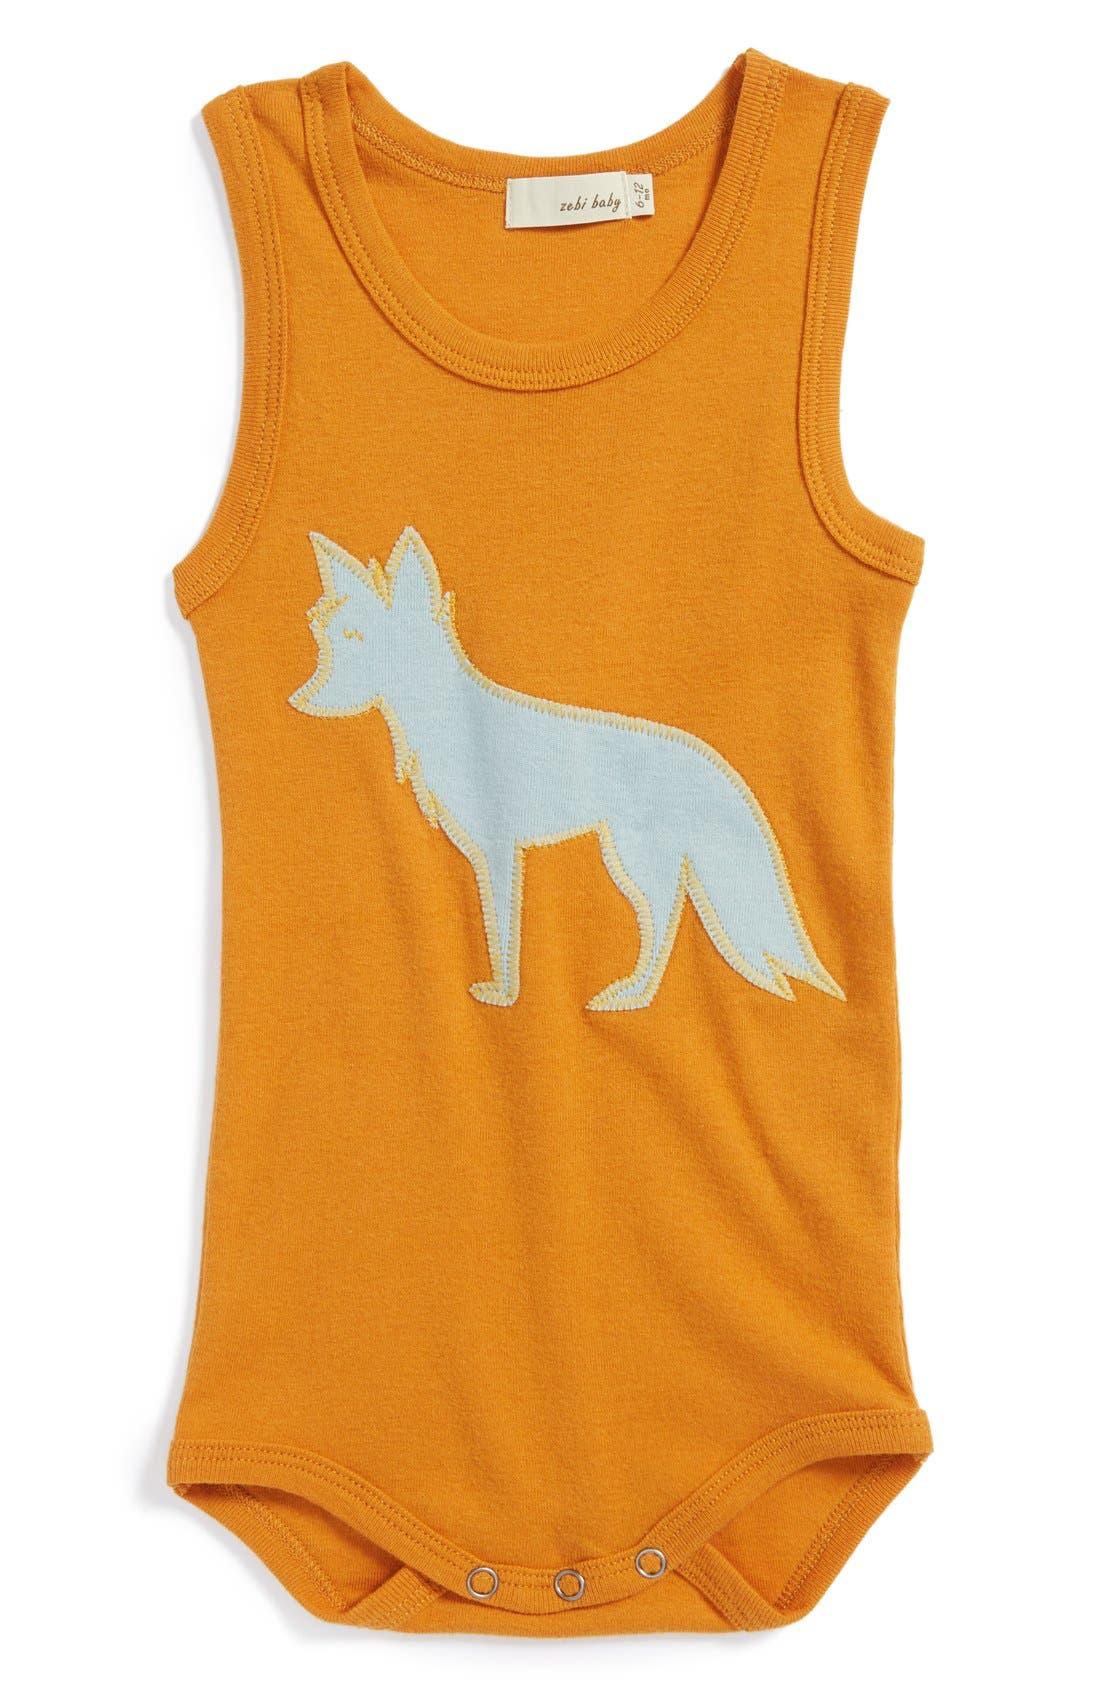 Alternate Image 1 Selected - Zebi Baby 'Fox' Organic Cotton Bodysuit (Baby Boys)